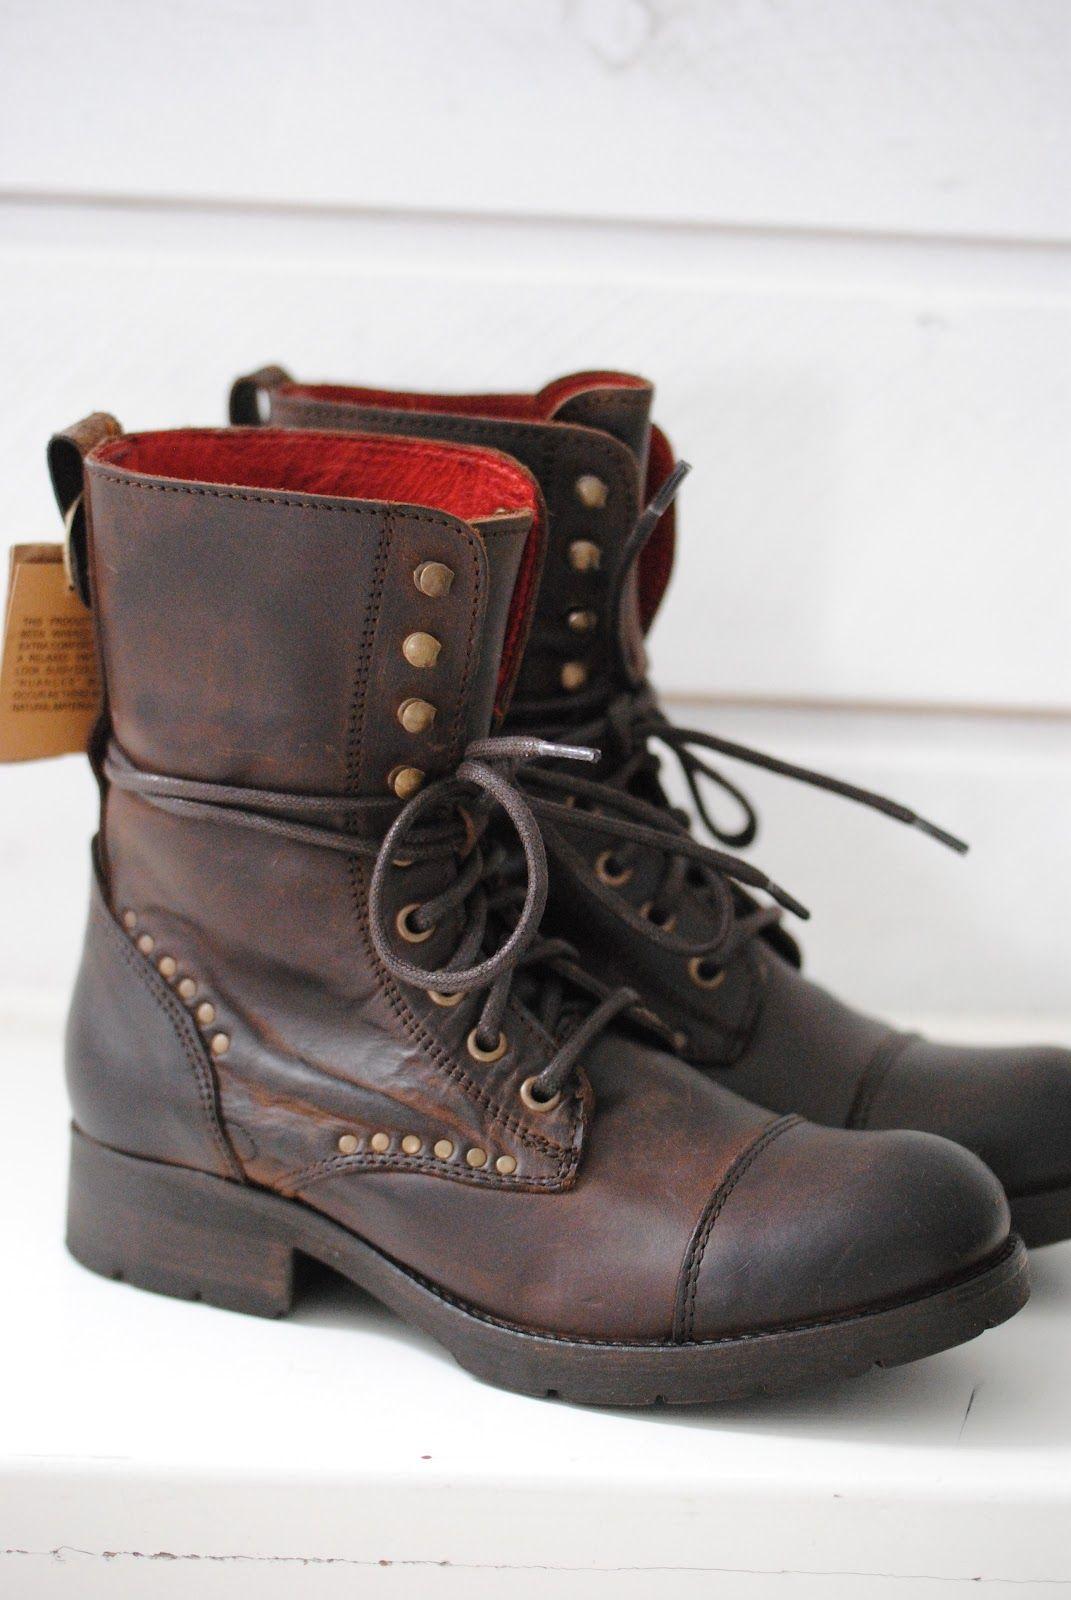 fb198c0d78399 Bottes En Cuir Marron · Fall boots from Village Koah   Biskopsgarden - Bottines  Lacets Femme